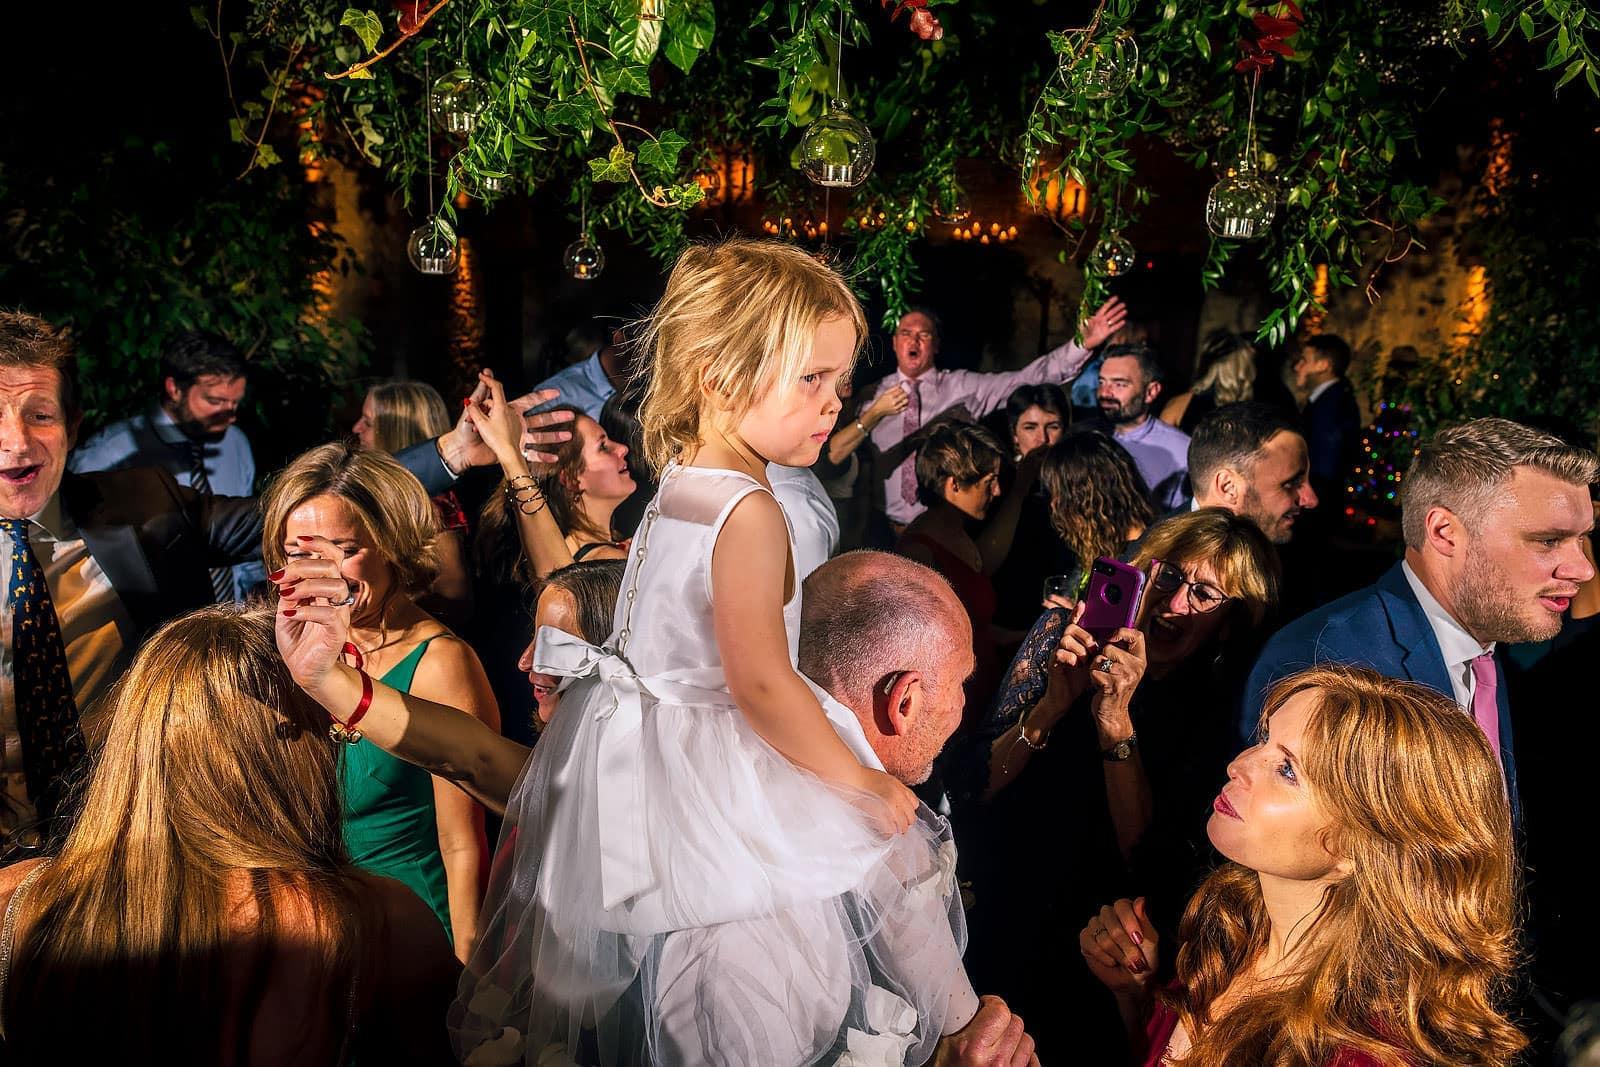 Drunk wedding guests having fun